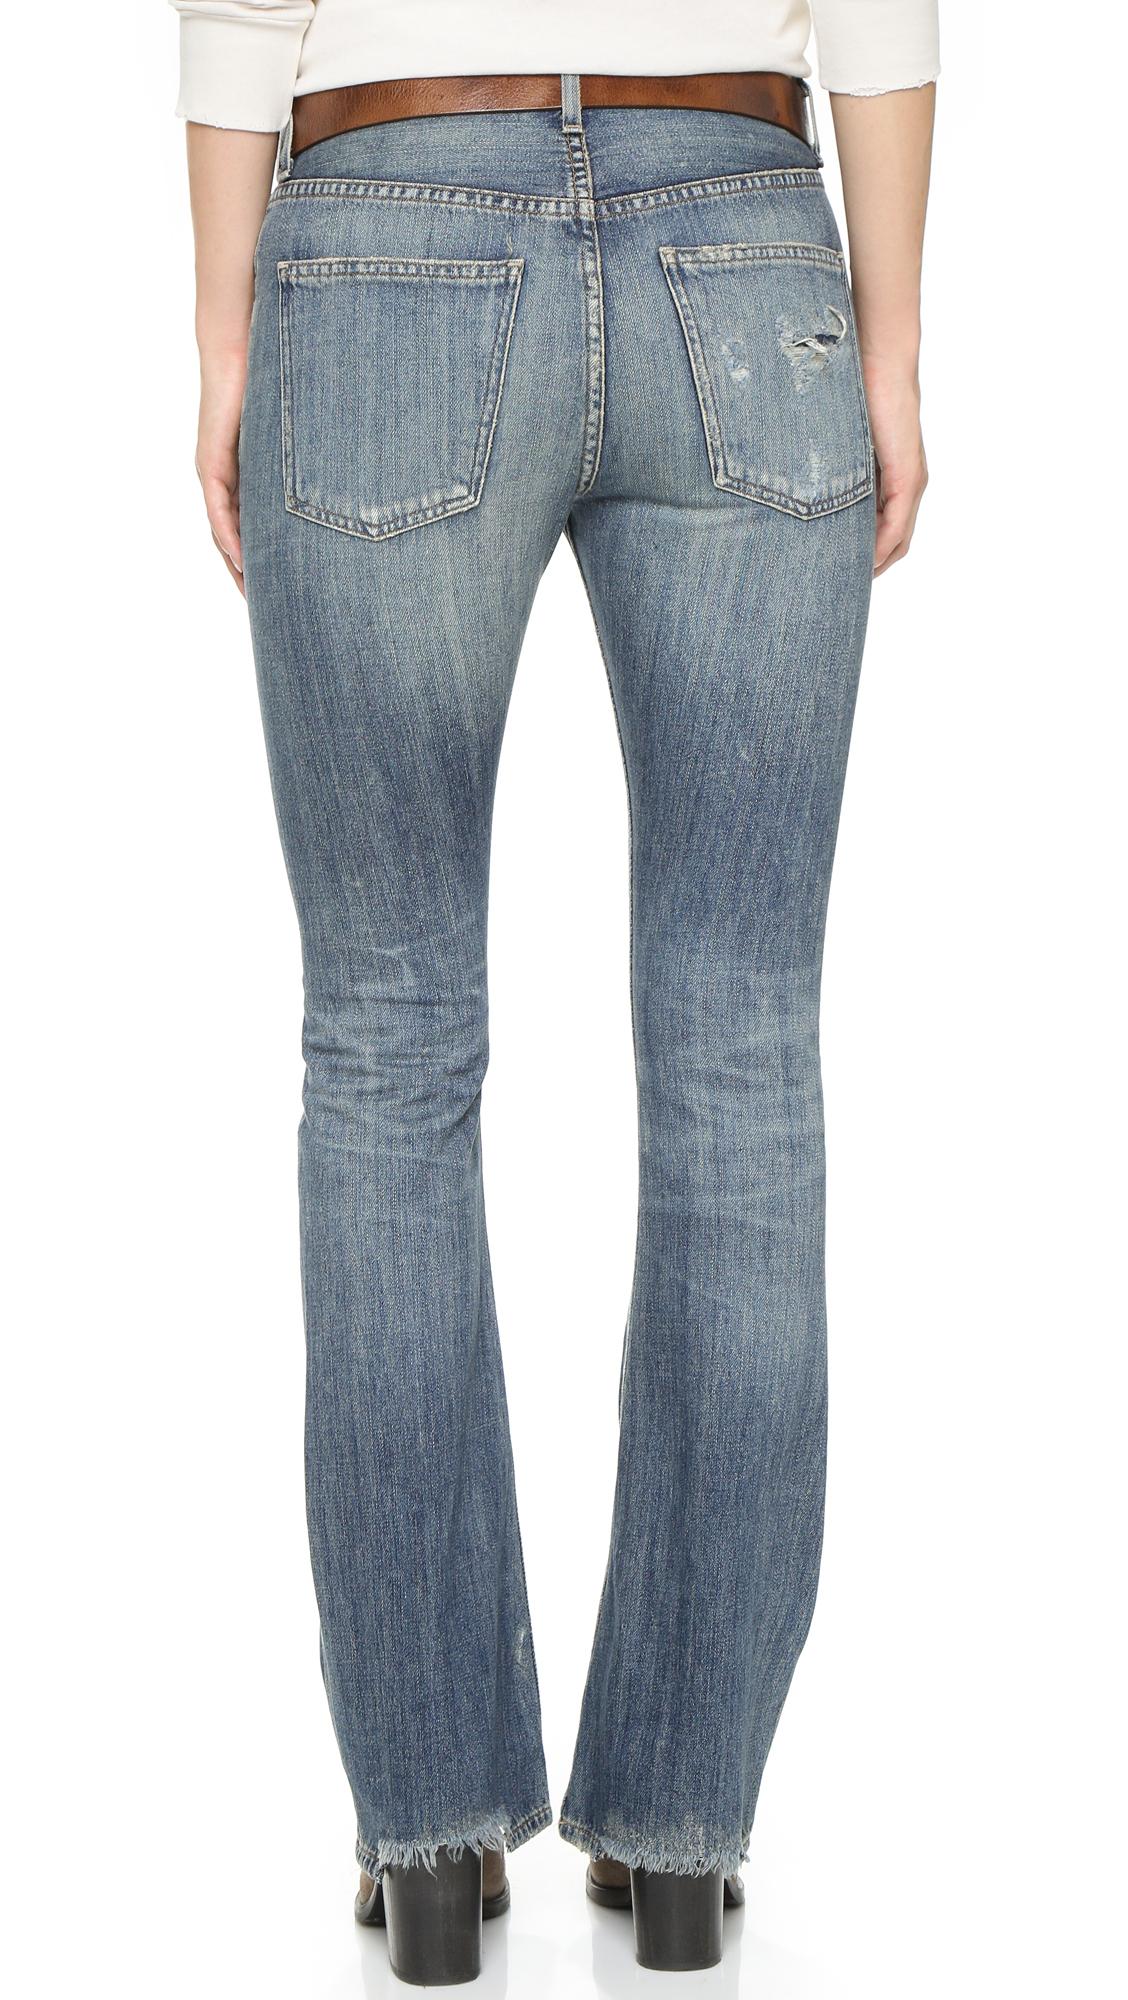 Citizens of Humanity Premium Vintage Sasha Twist Flare Jeans - Freemont in Blue